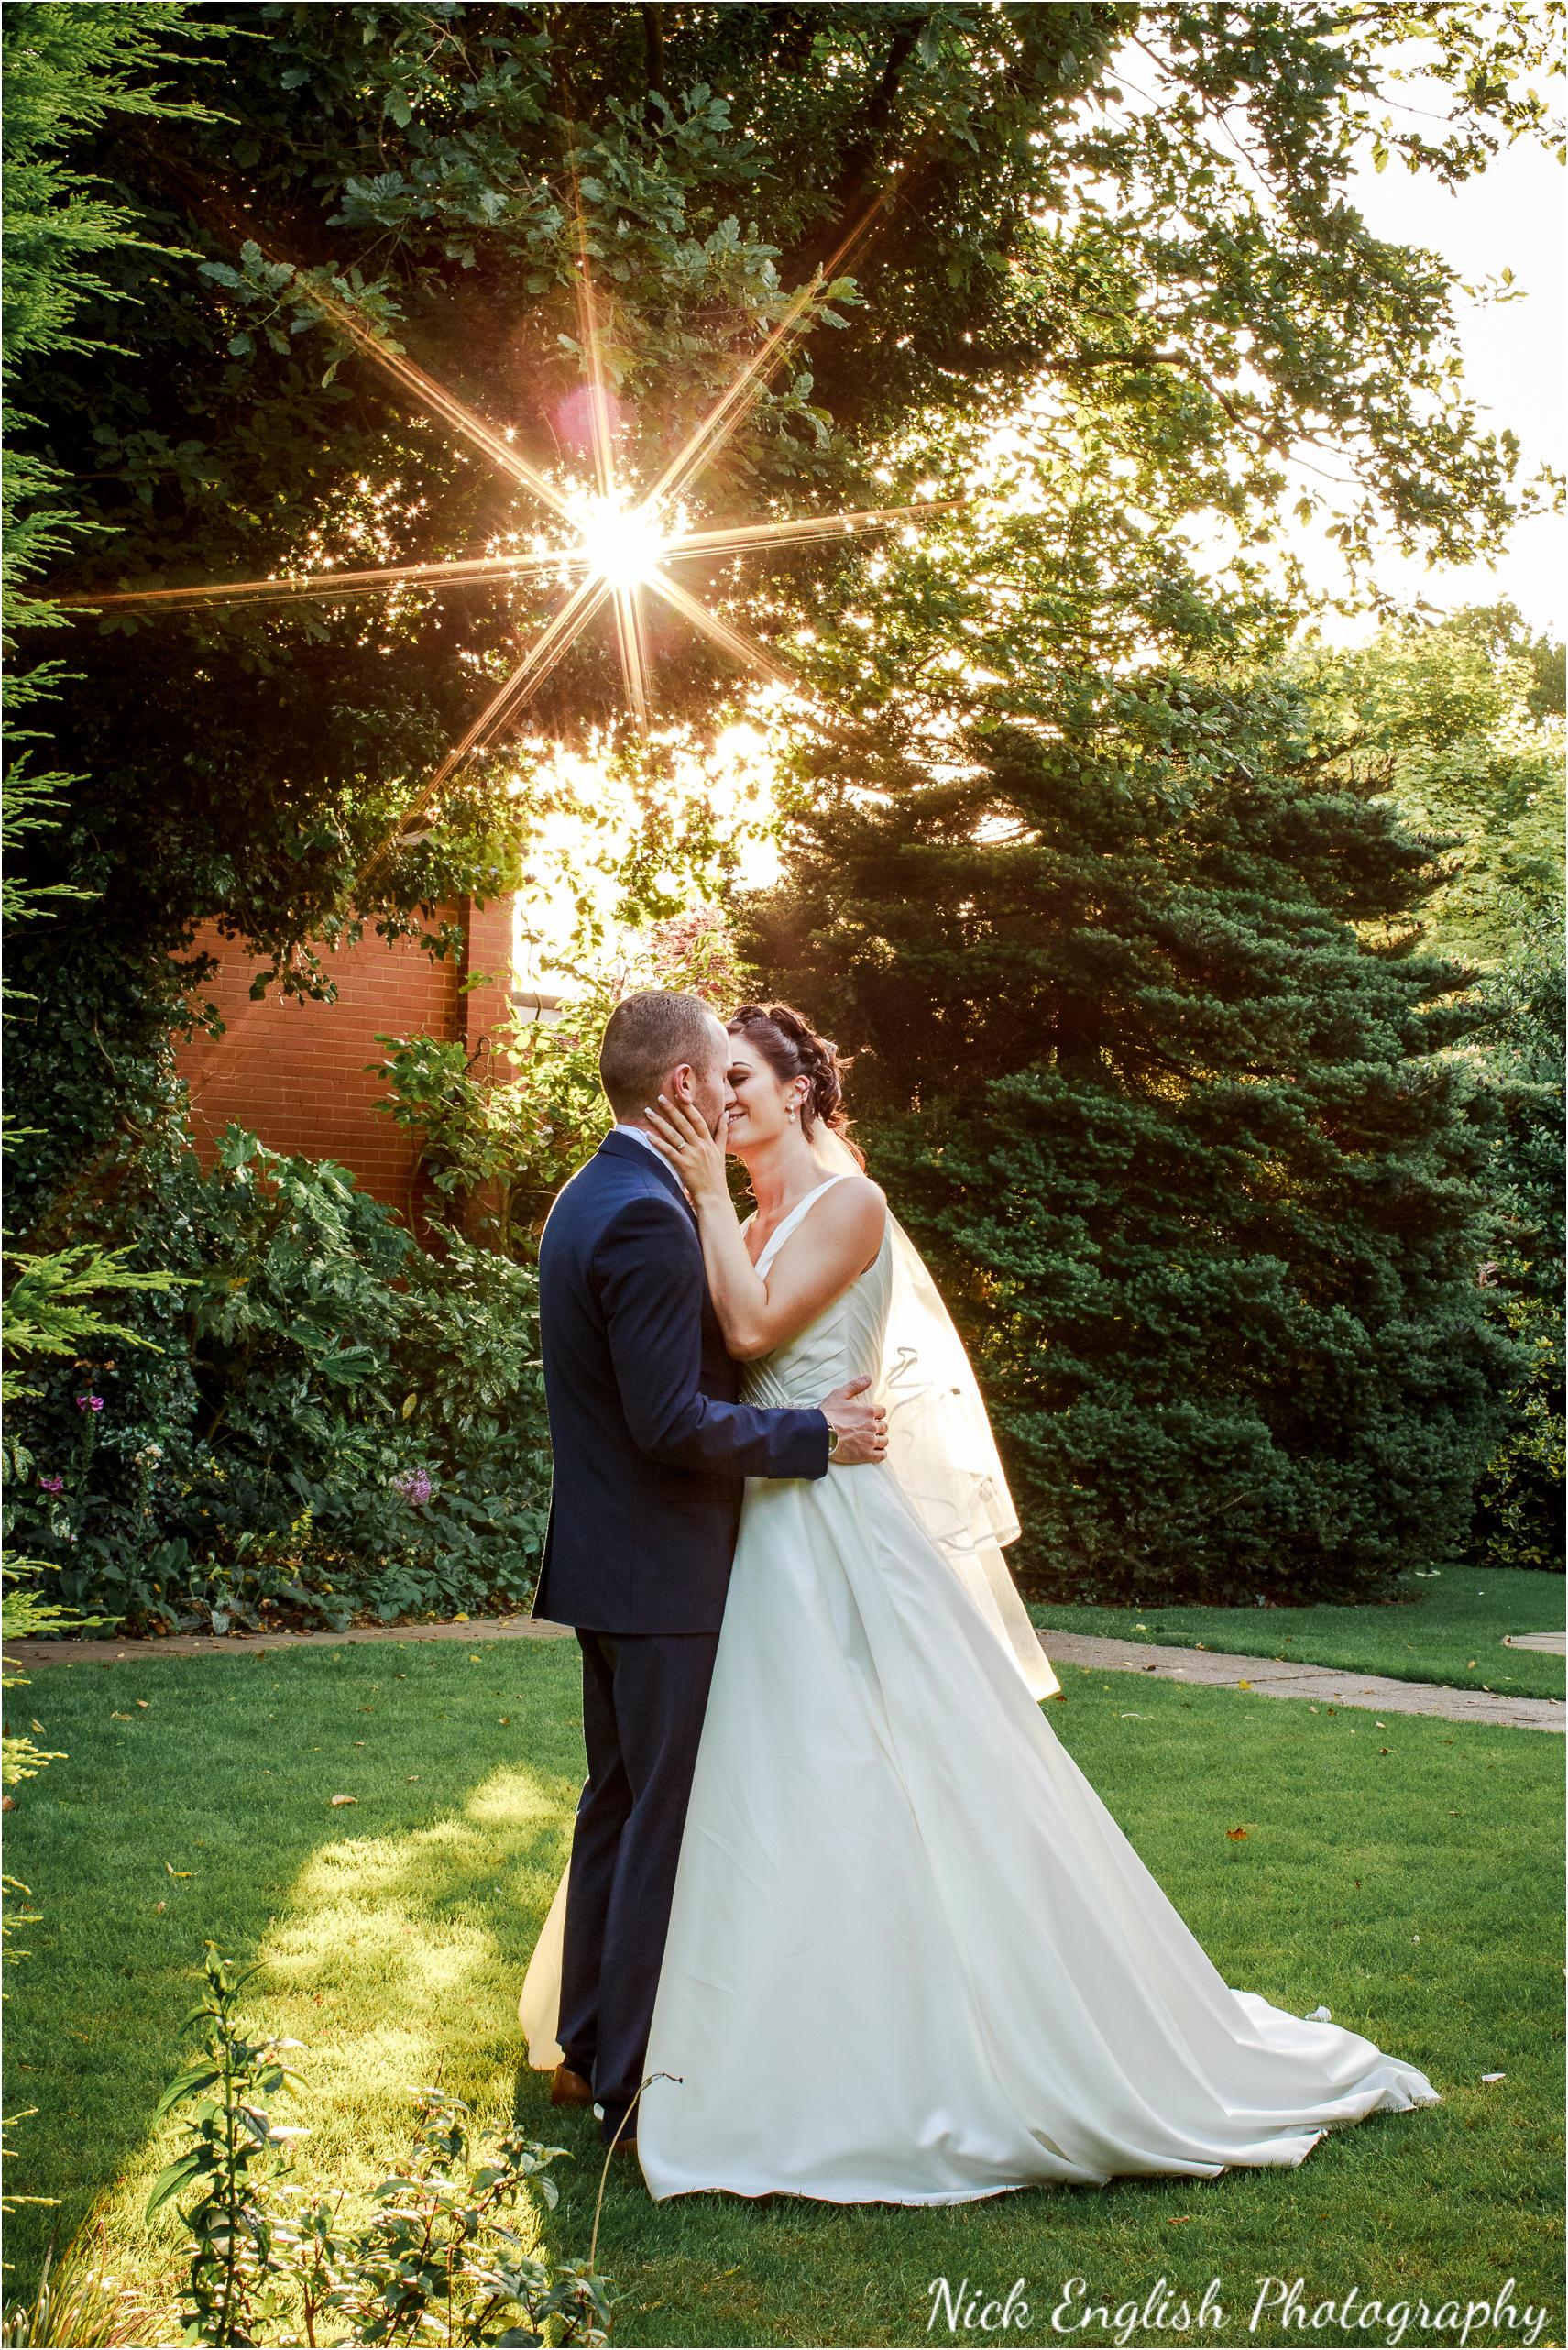 Emily David Wedding Photographs at Barton Grange Preston by Nick English Photography 200jpg.jpeg